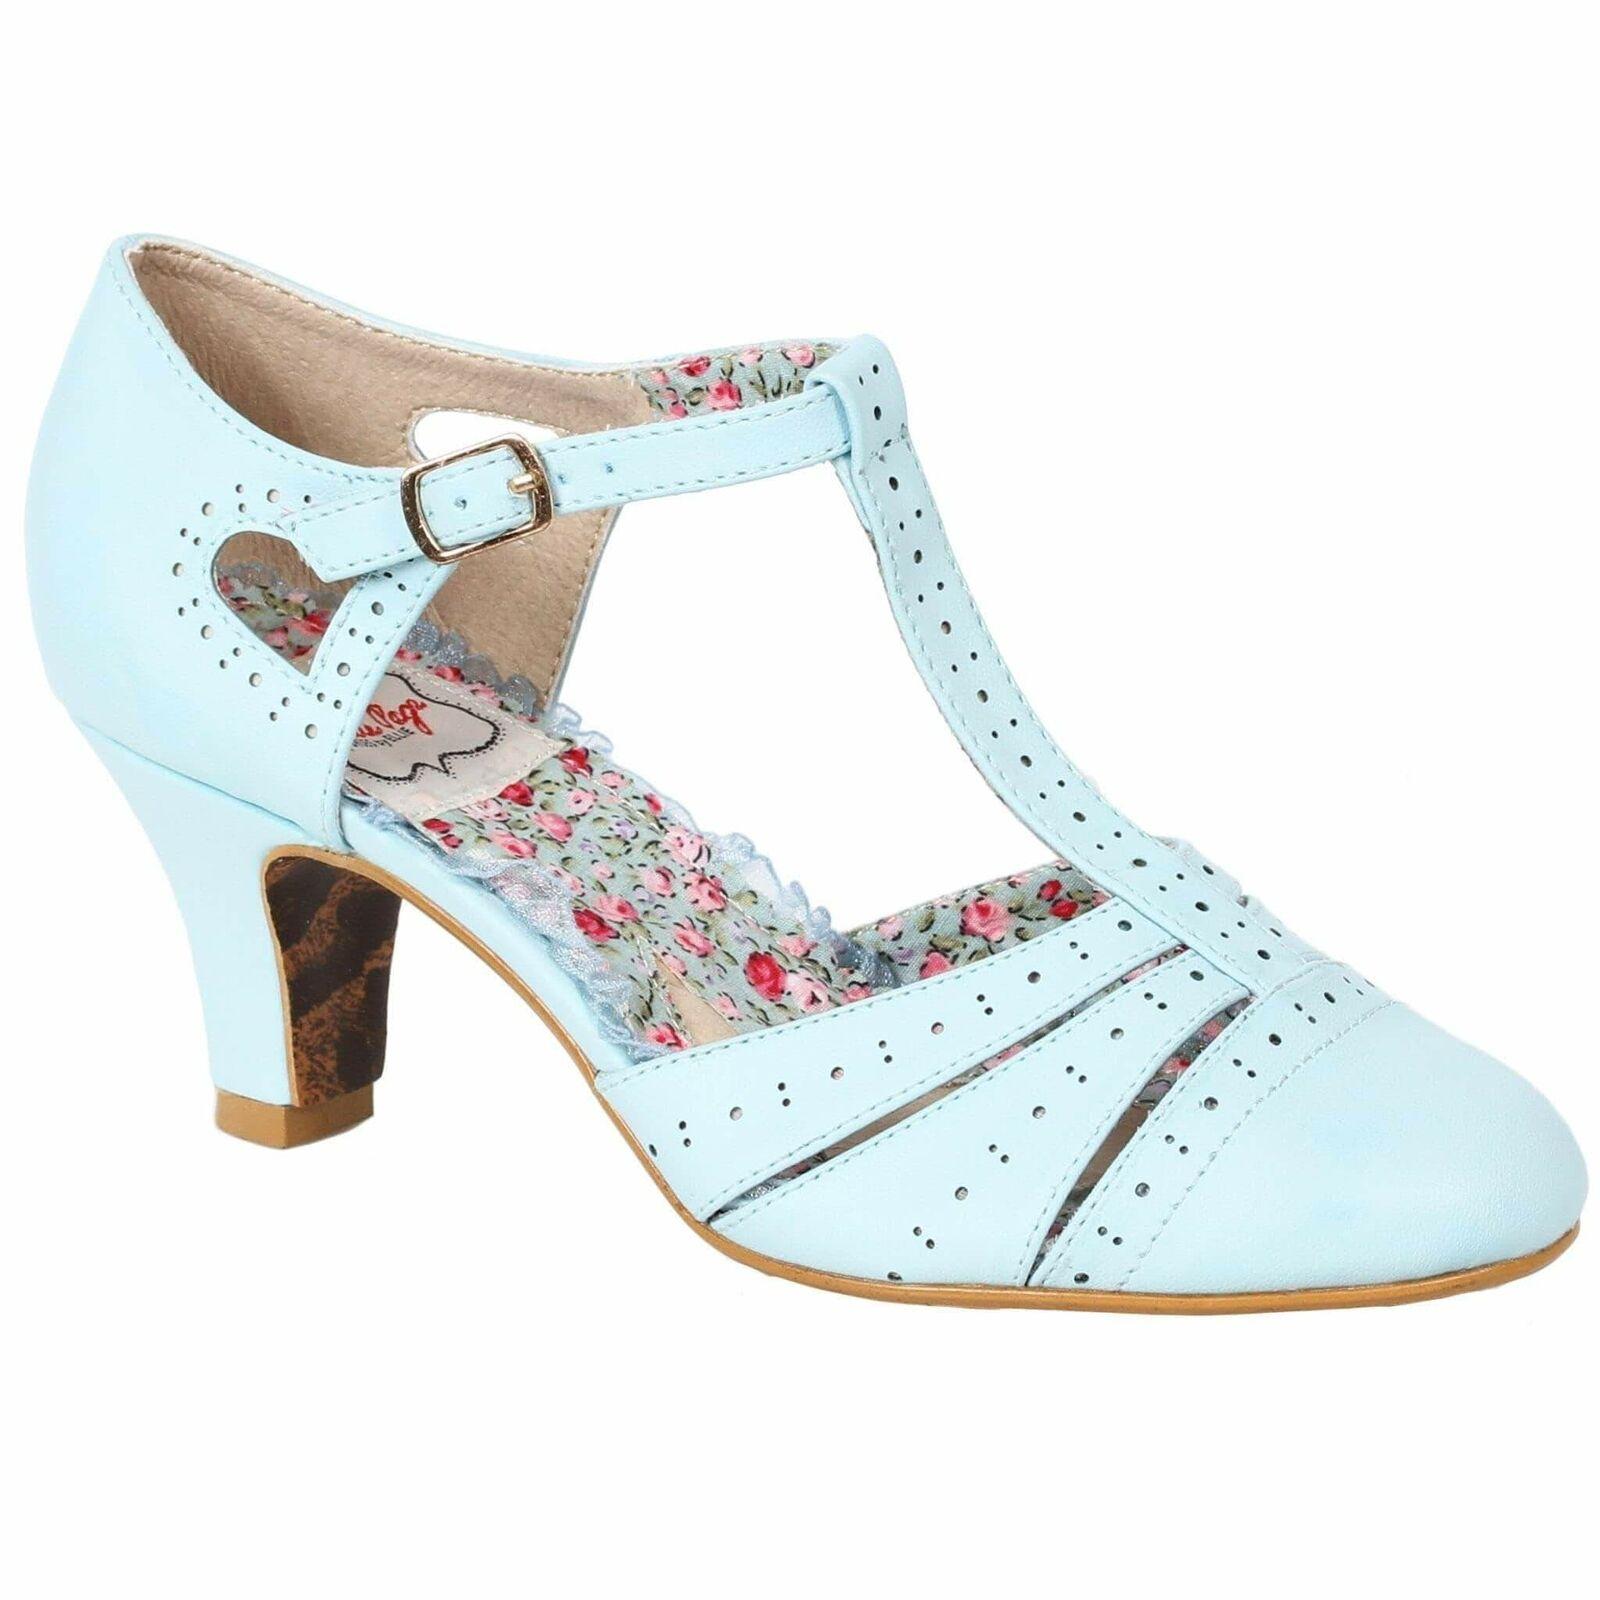 Bettie Page chaussures Maisie bleu Retro Rockabilly Vintage Casual Cute 6-11